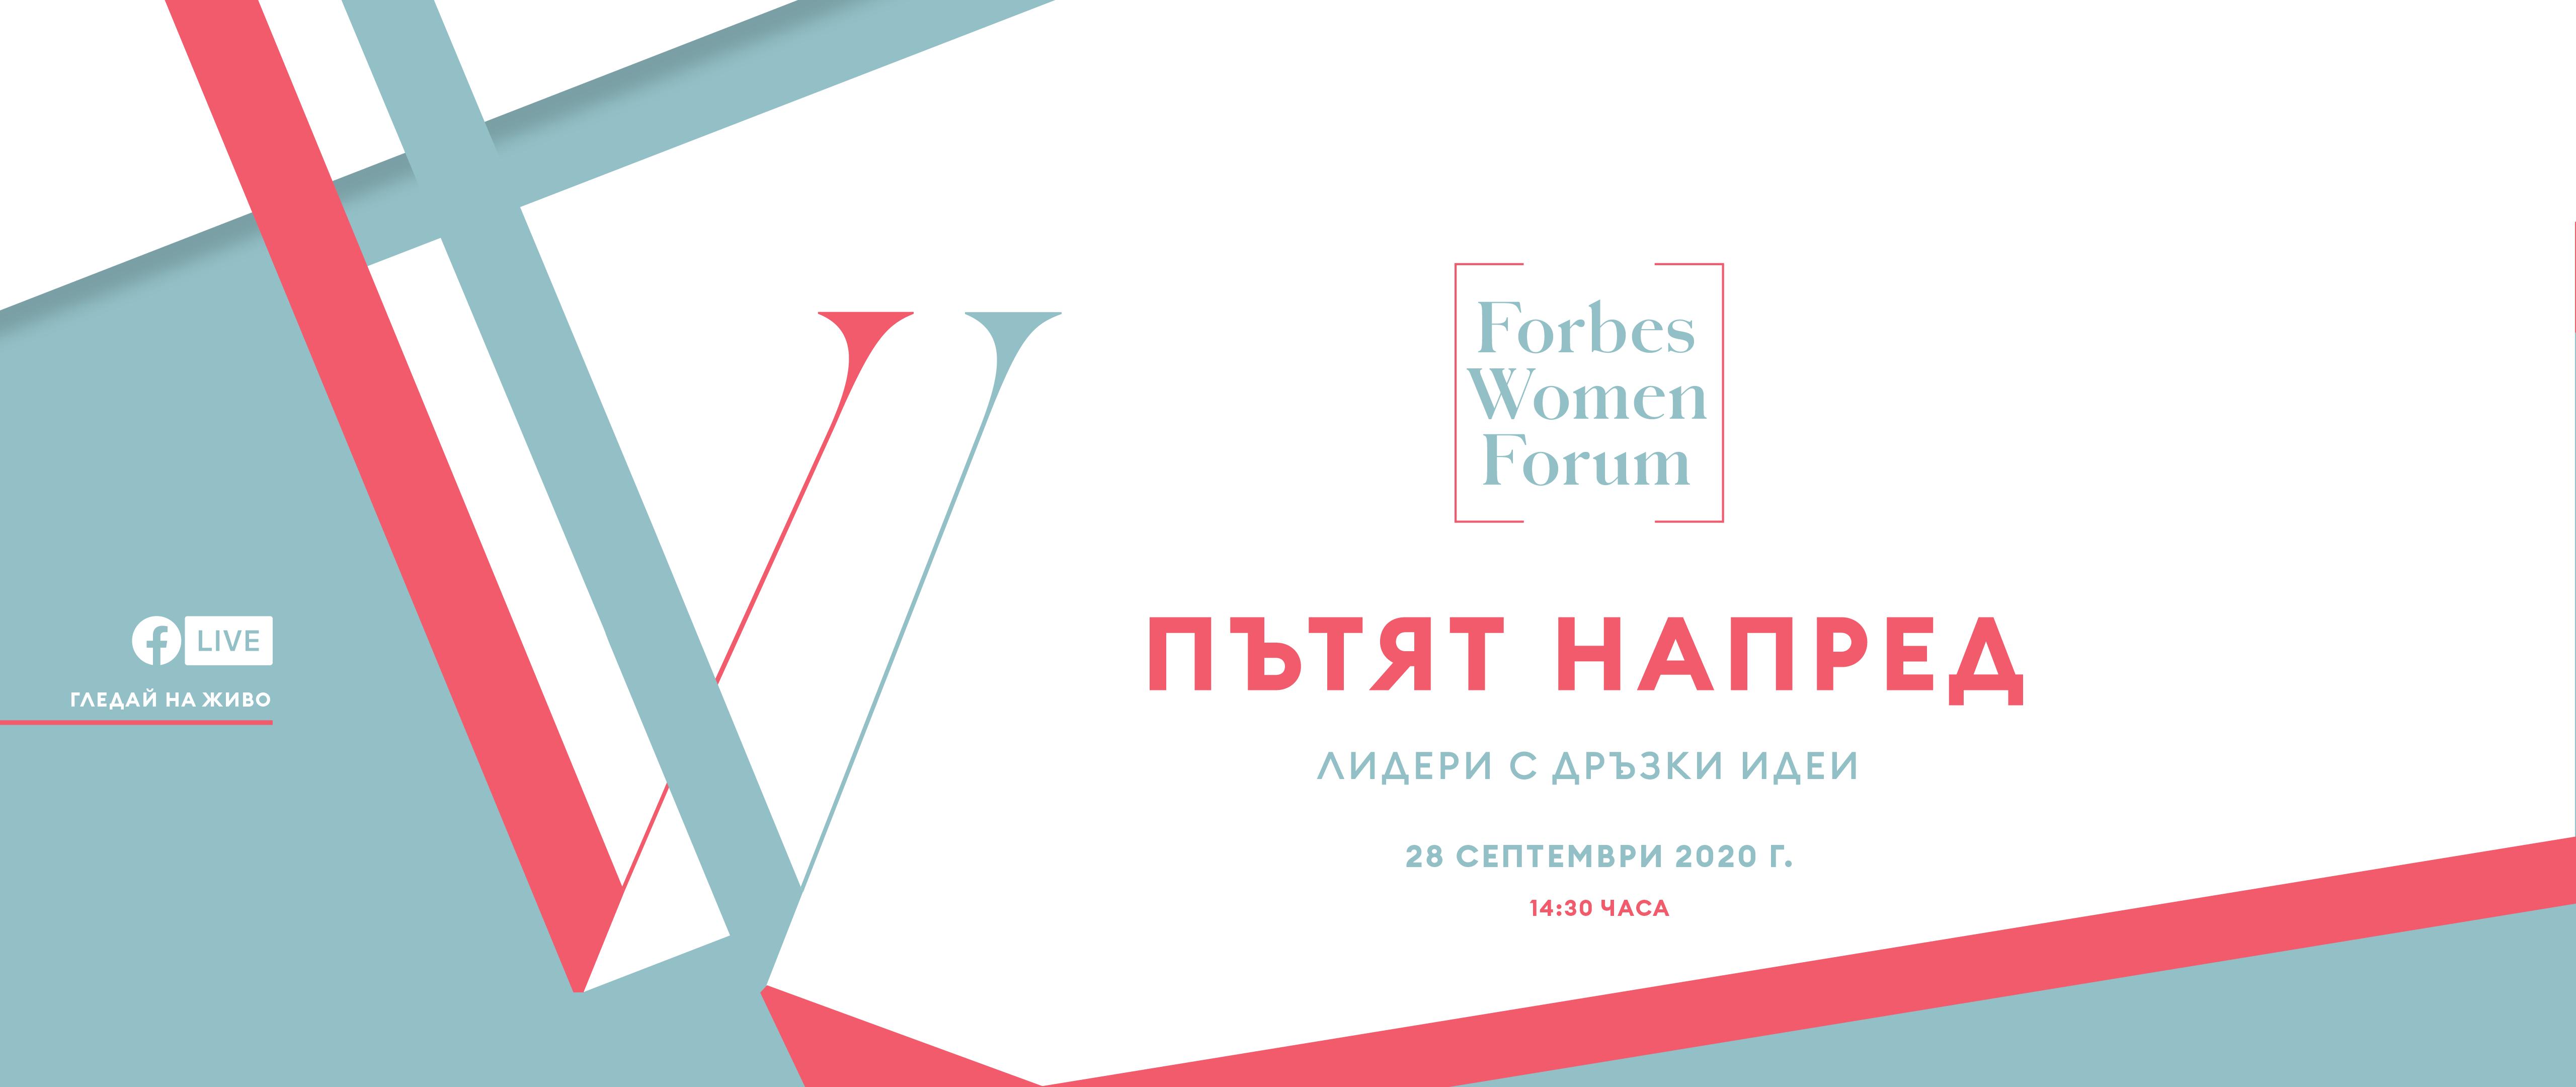 Forbes-Bulgaria-Women-Forum-Header-2020